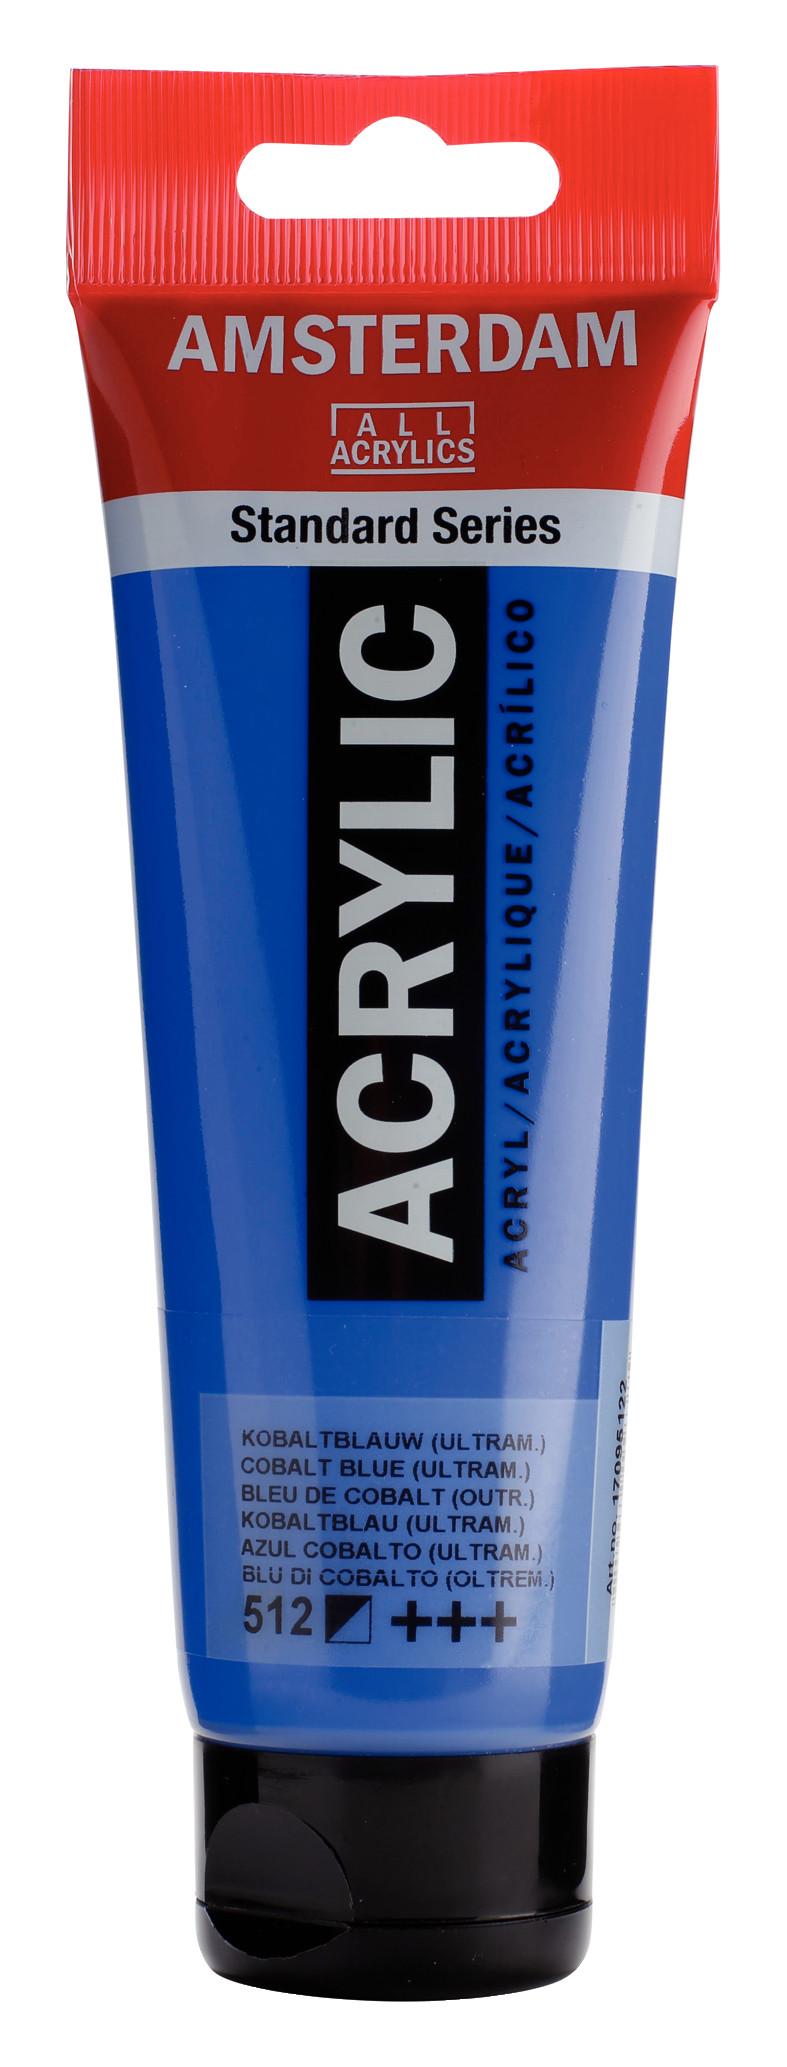 Amsterdam Standard Series Acrylic Tube 120 ml Cobalt blue (ultramine) 512